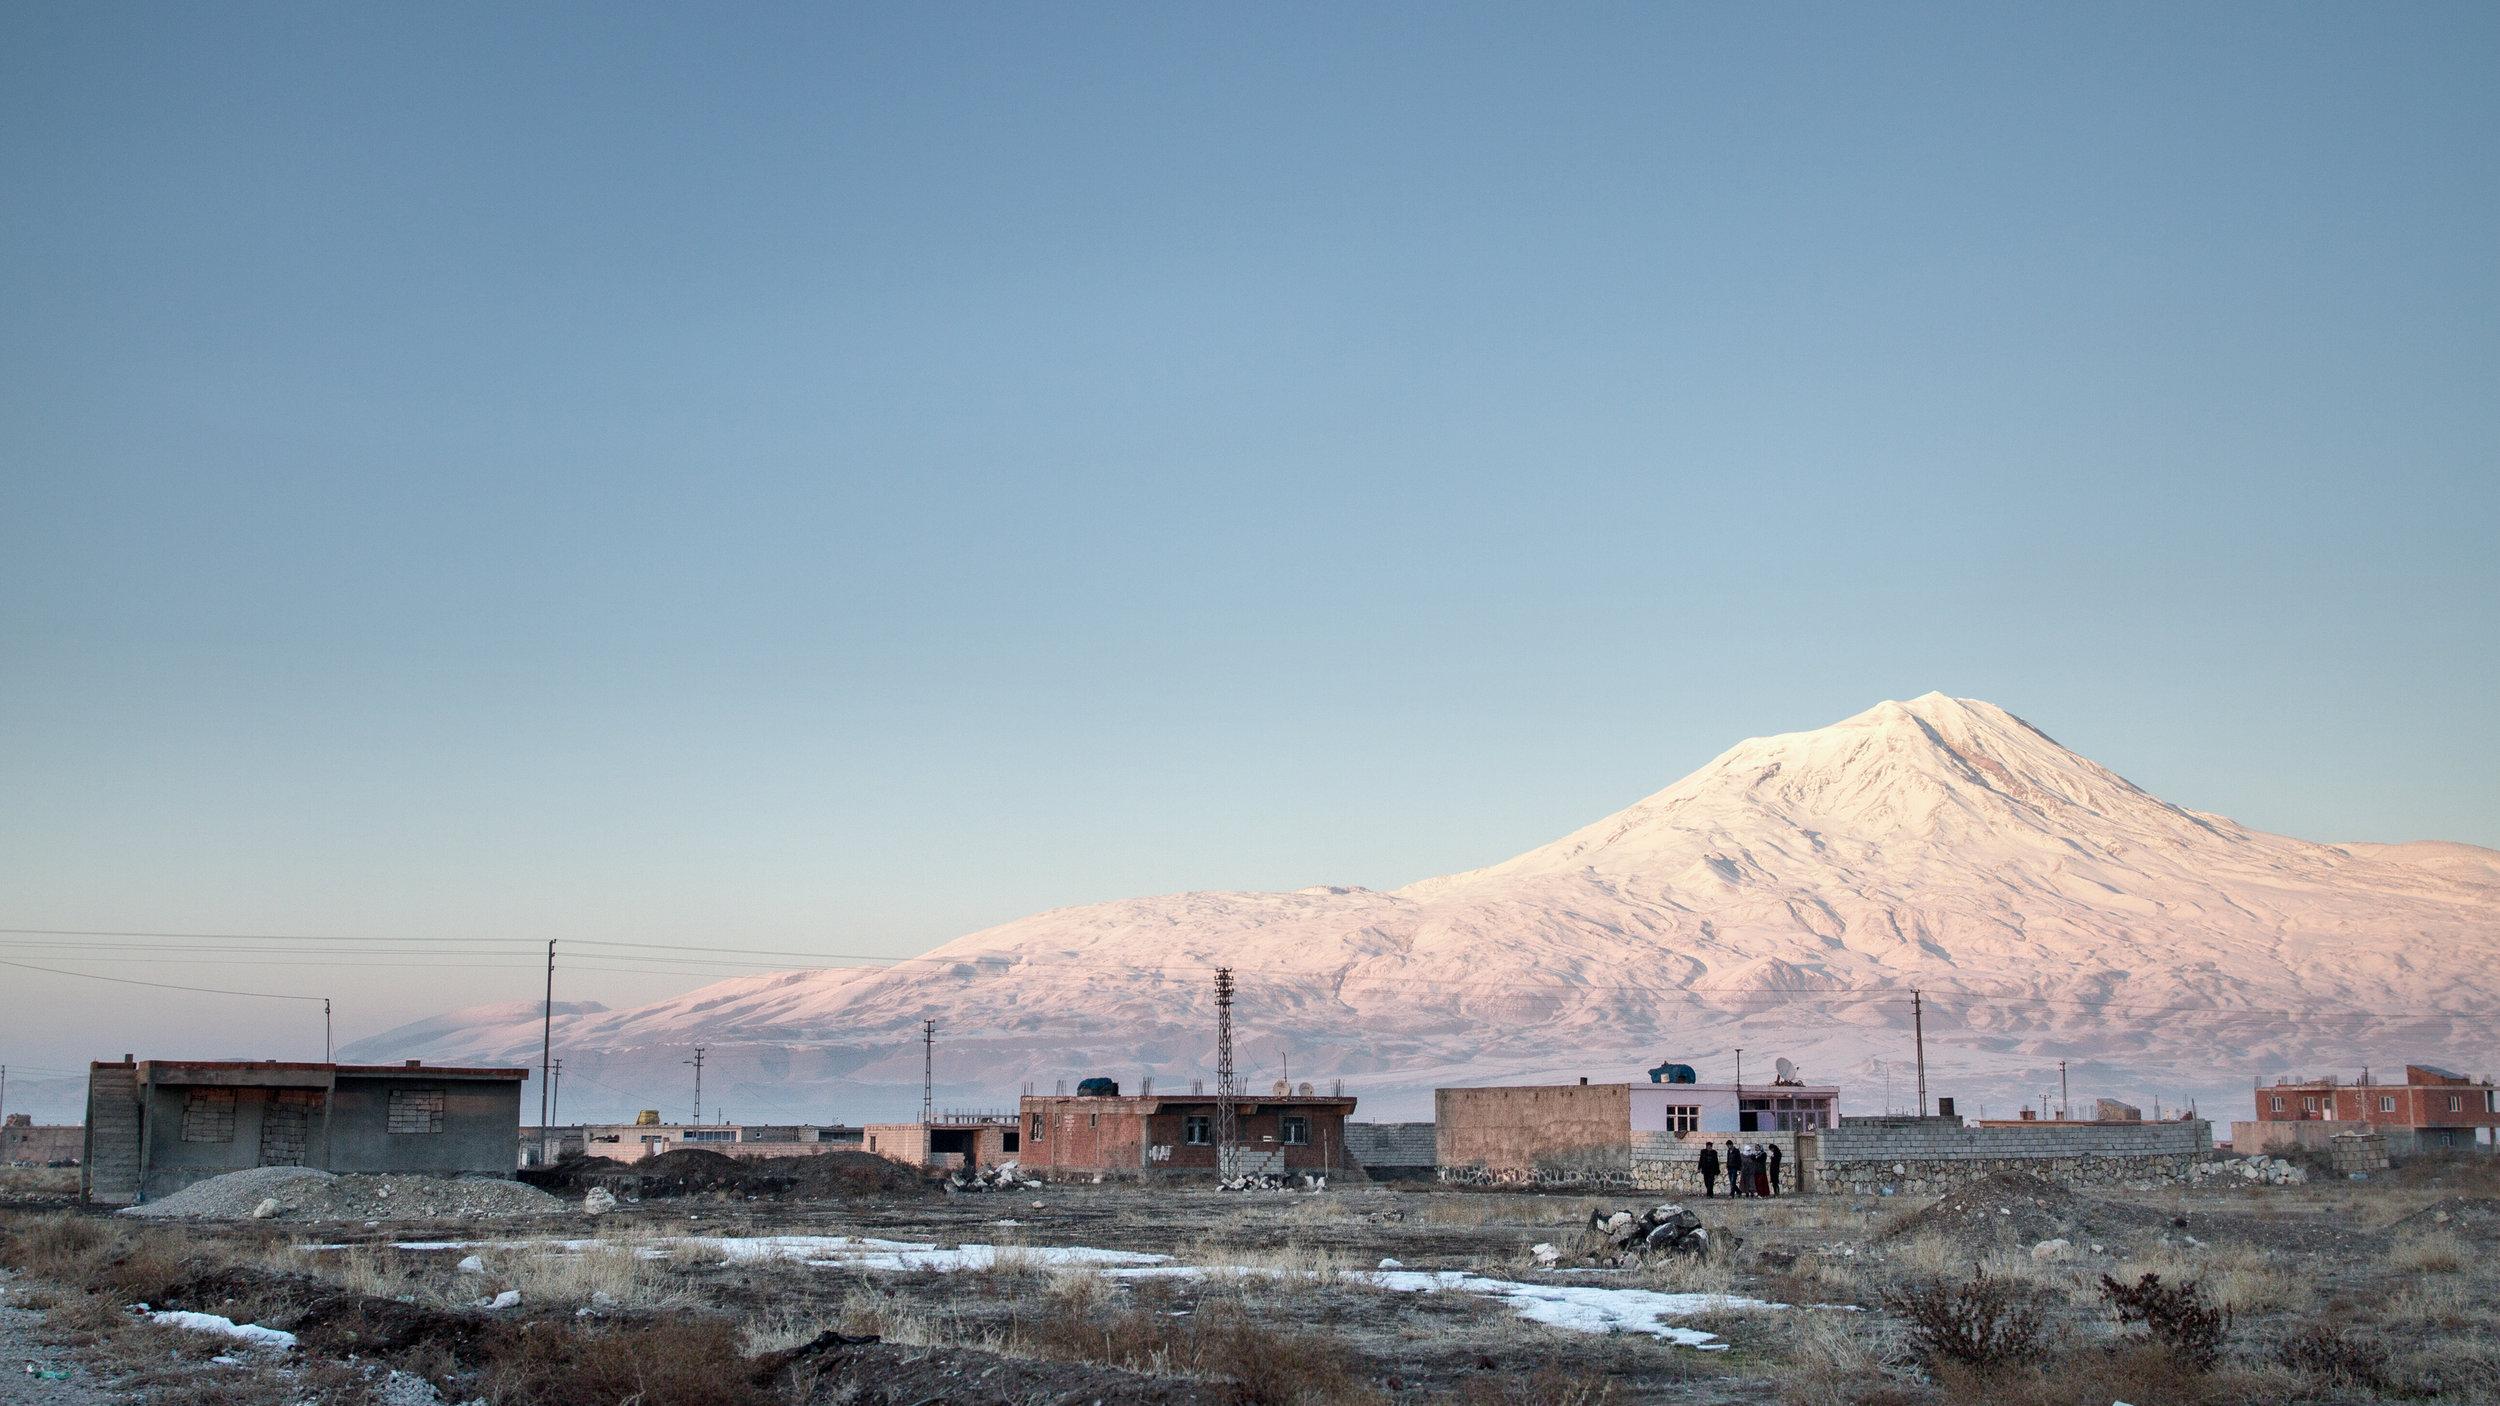 Mount Ararat as seen from Doğubayazıt, Turkey